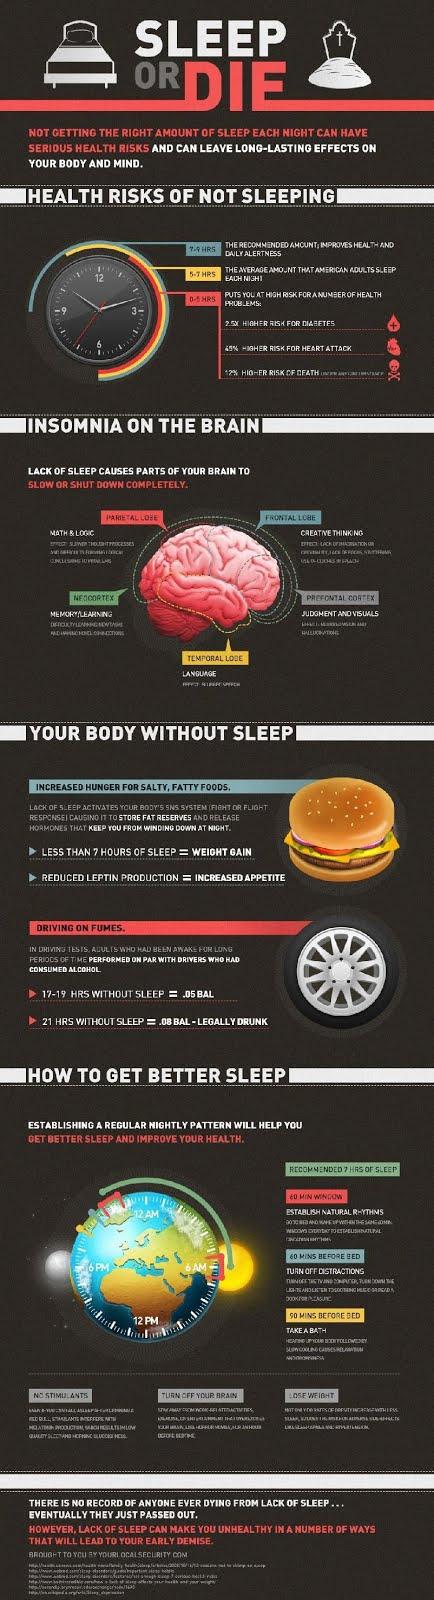 Продуктивность сна